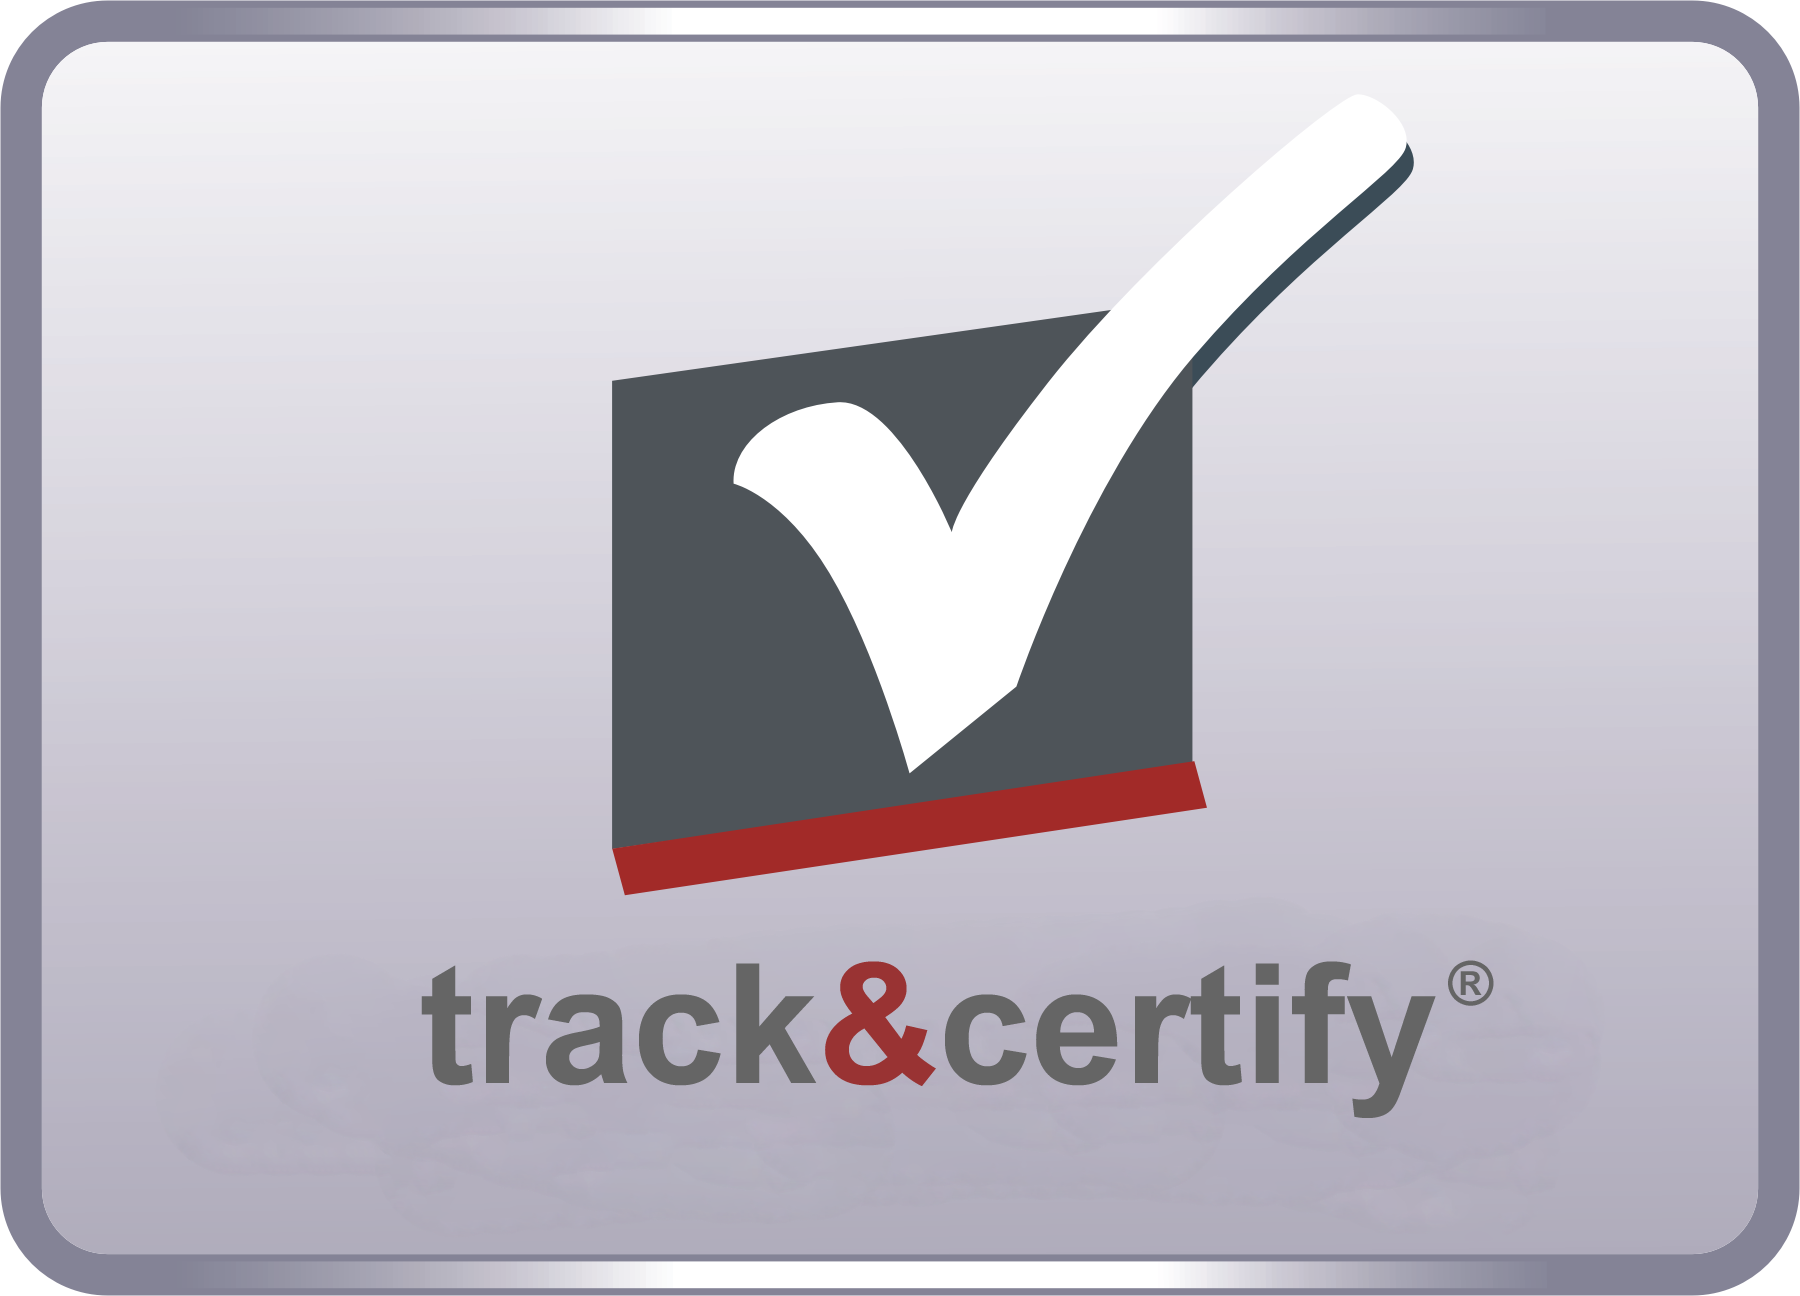 track&certify